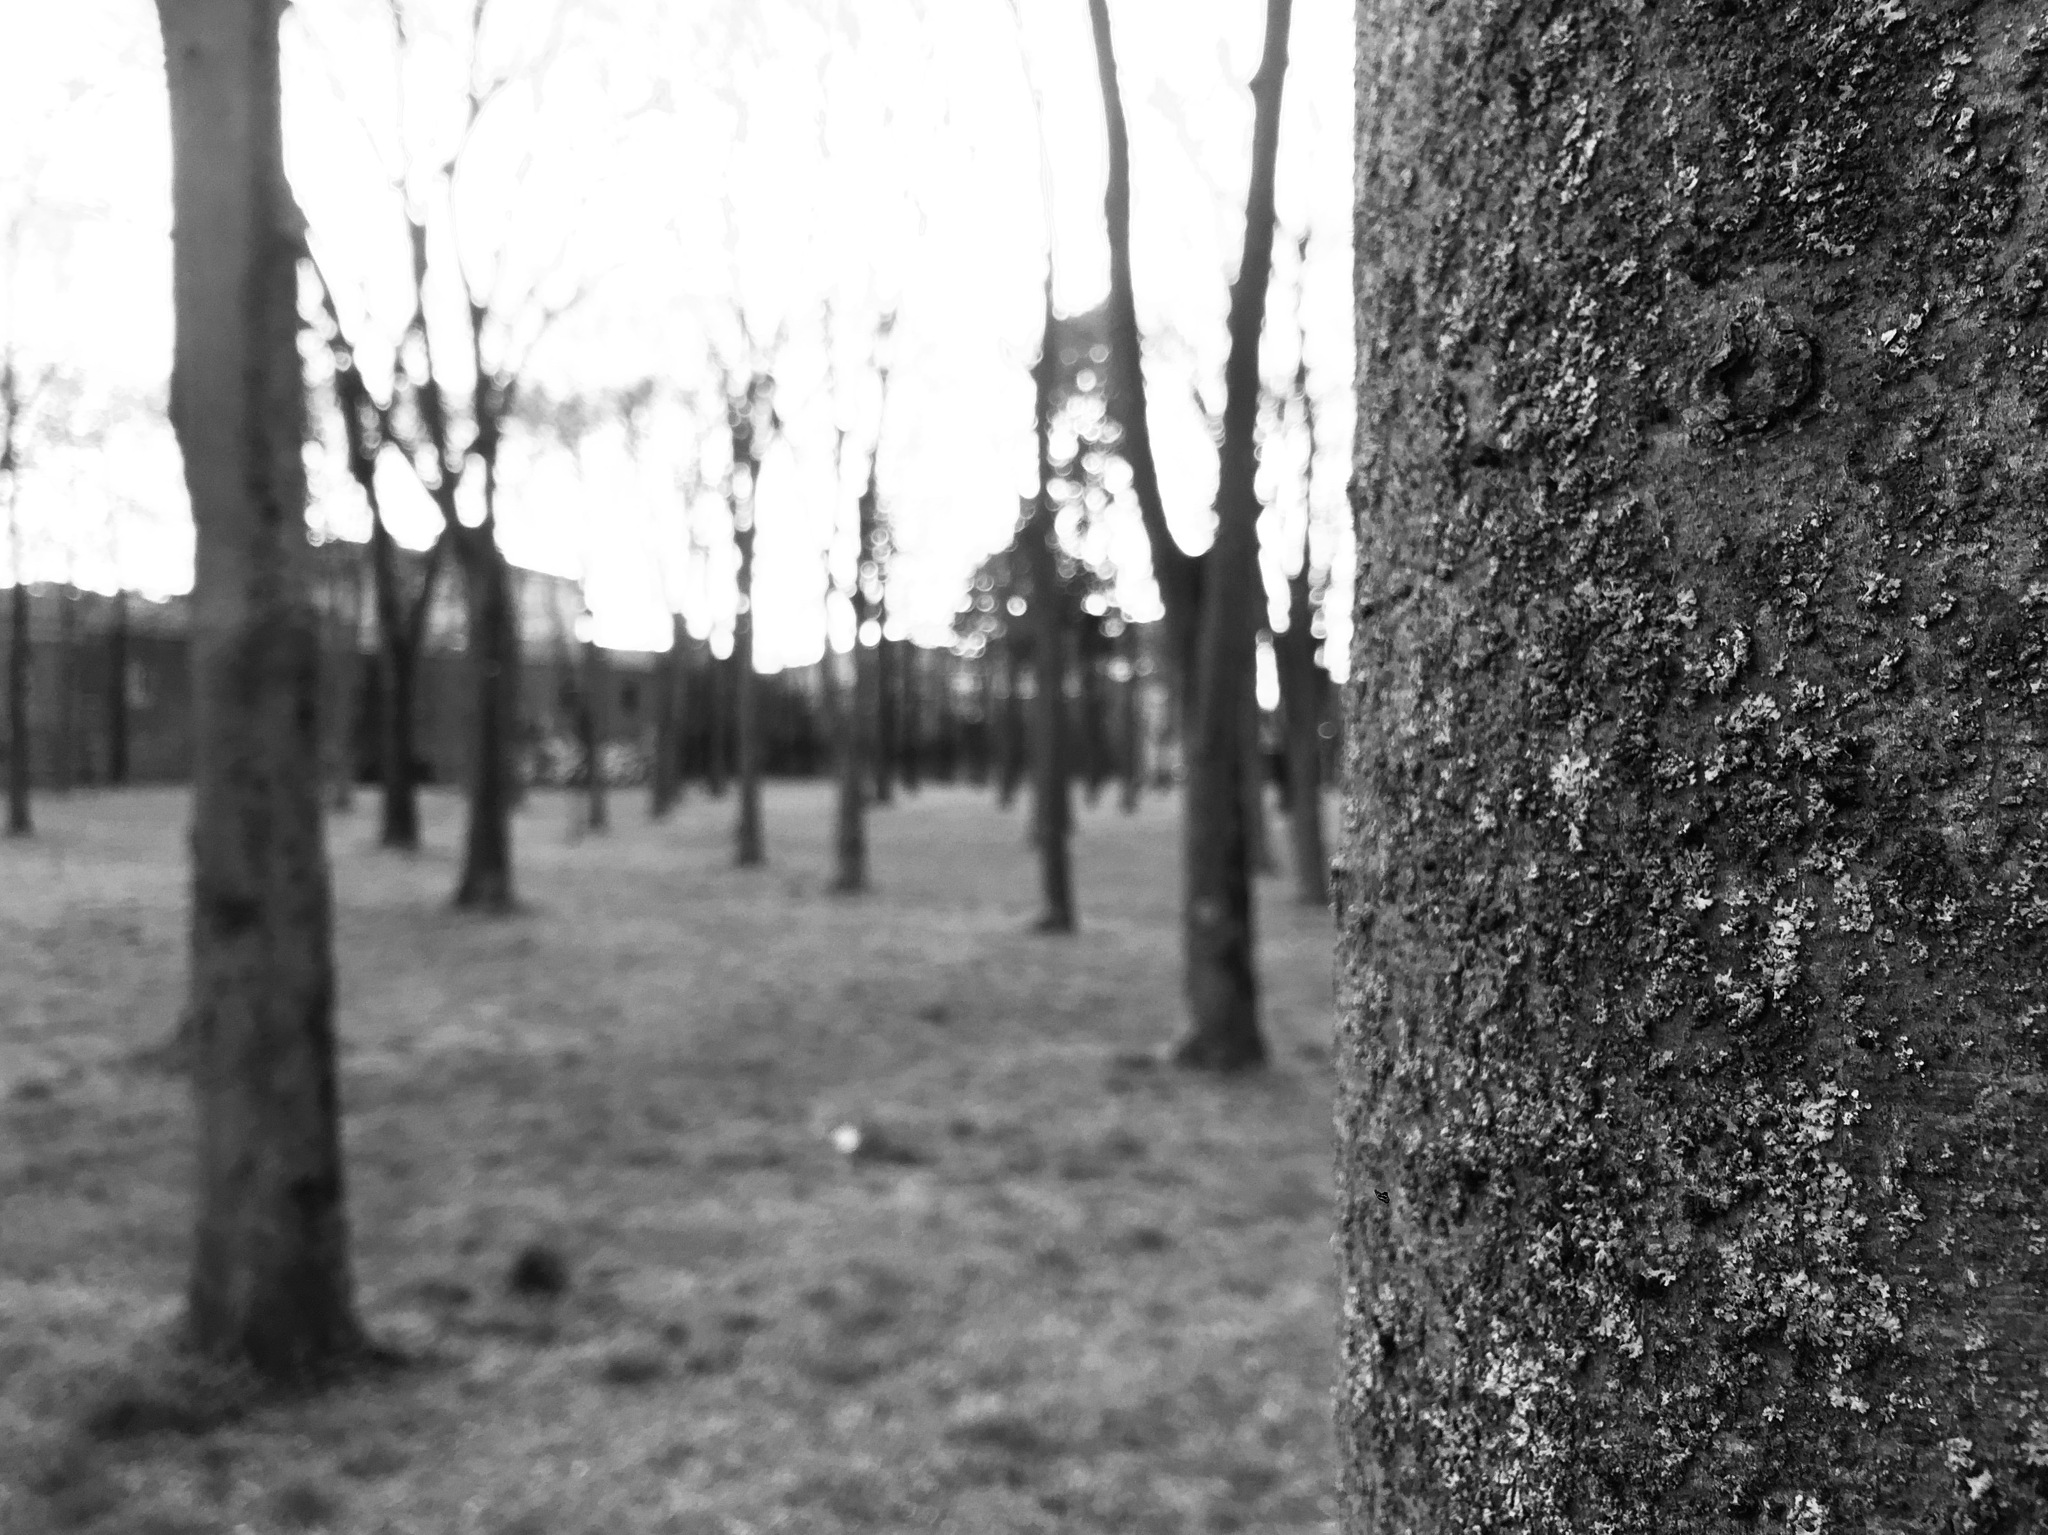 shadow tree by Ale Caprara